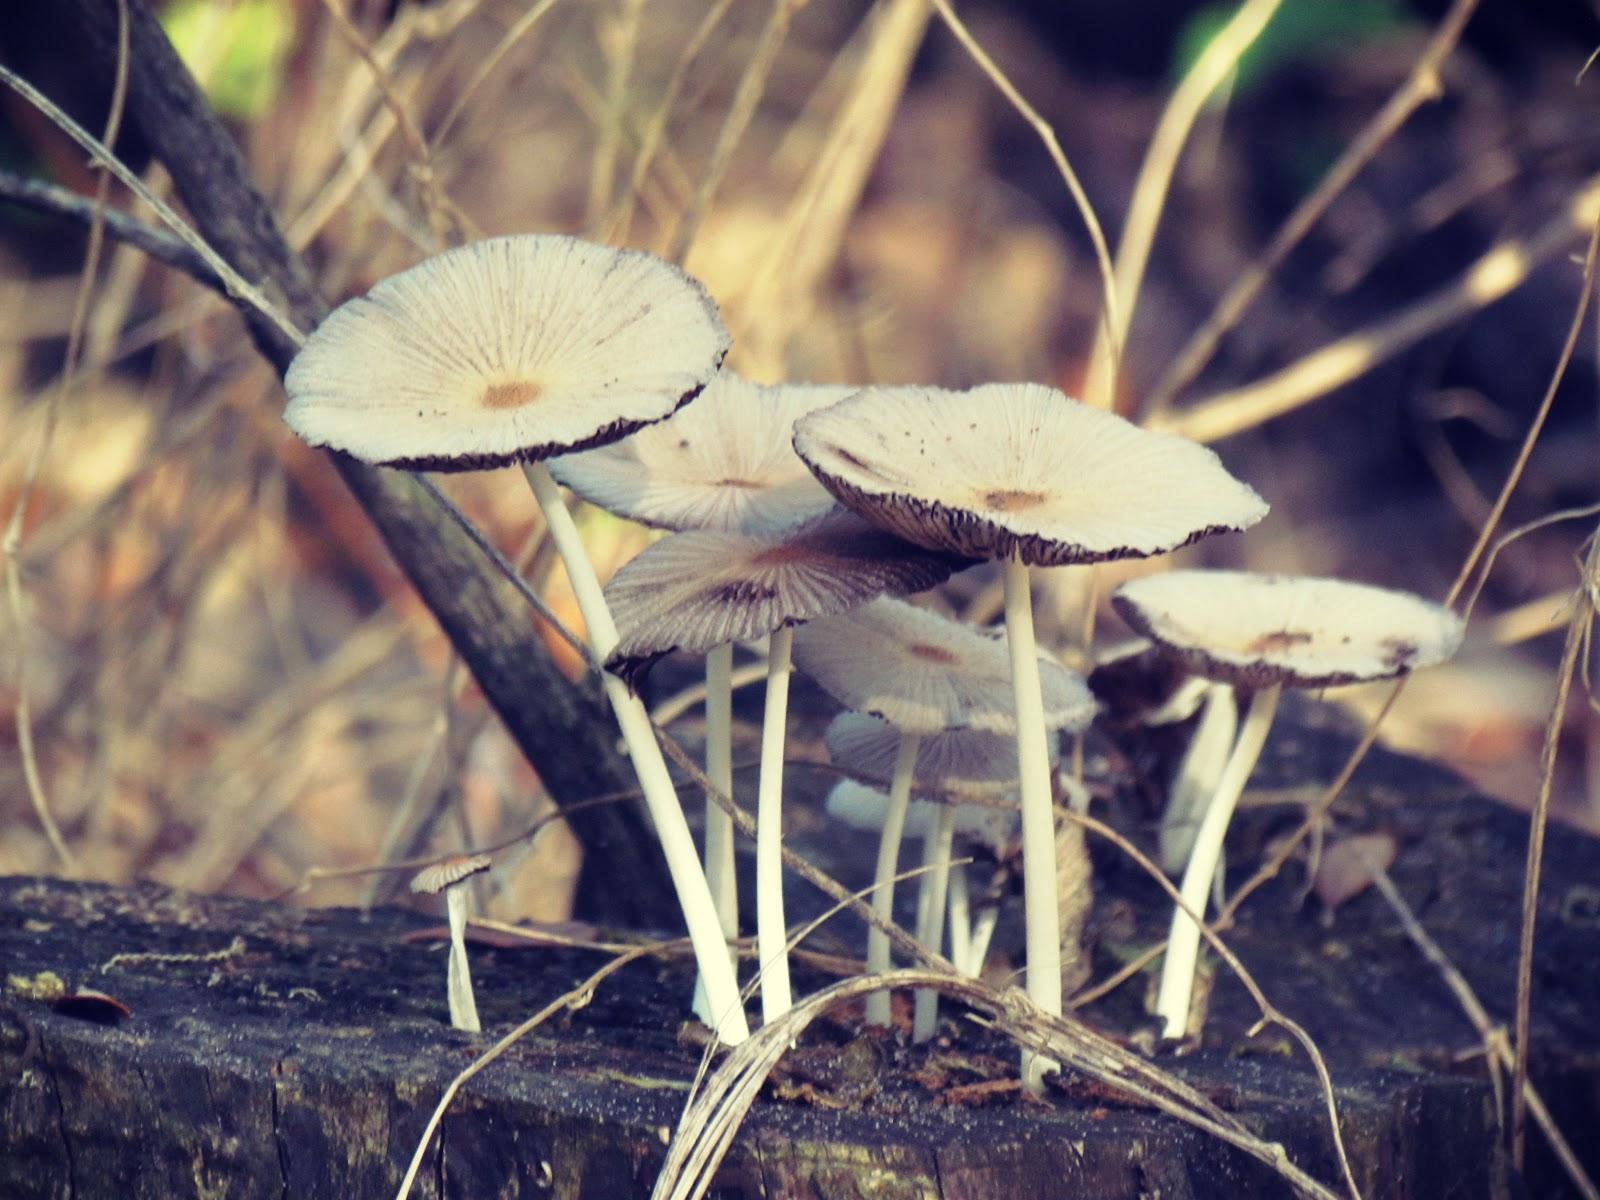 Forage for Mushrooms During Florida's Autumn Mushroom Hunting Season